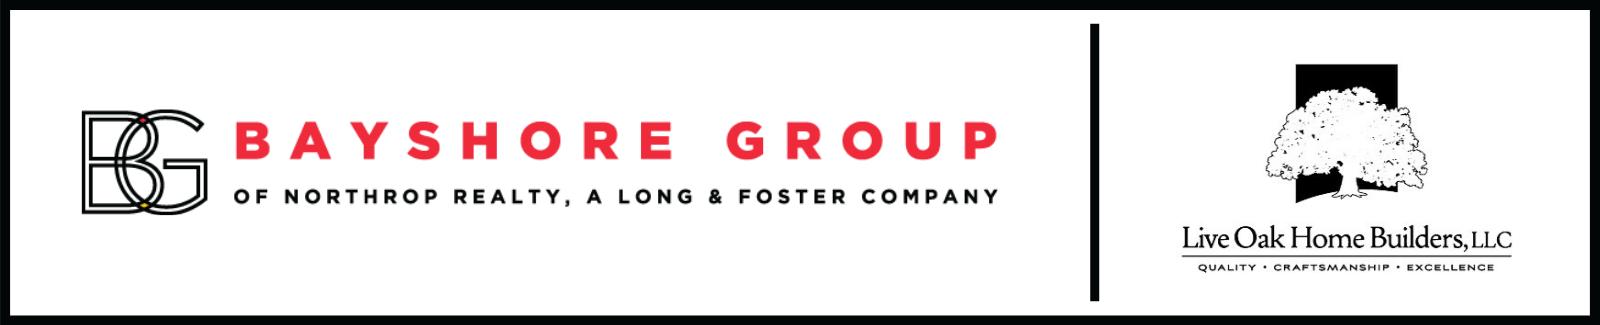 BayShore Group + Live Oak Homebuilders